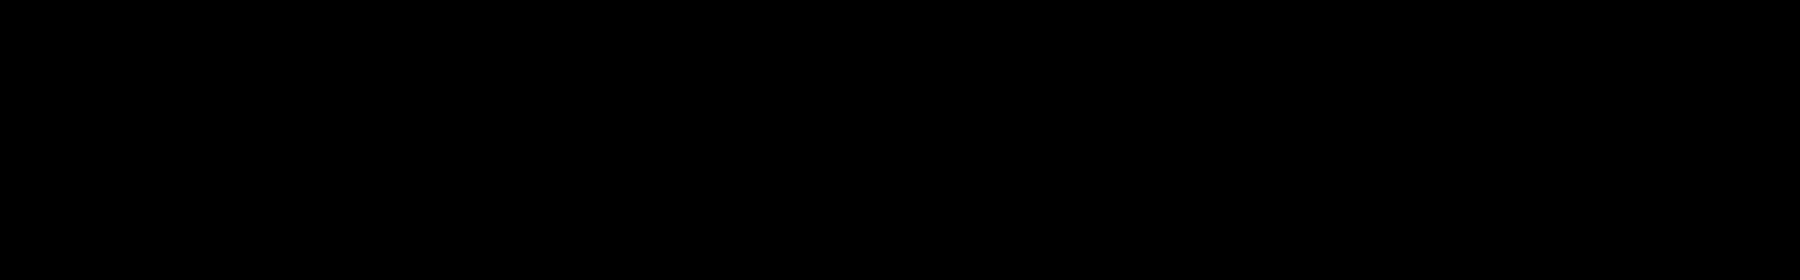 ODEZSA VIBES Serum Suite audio waveform